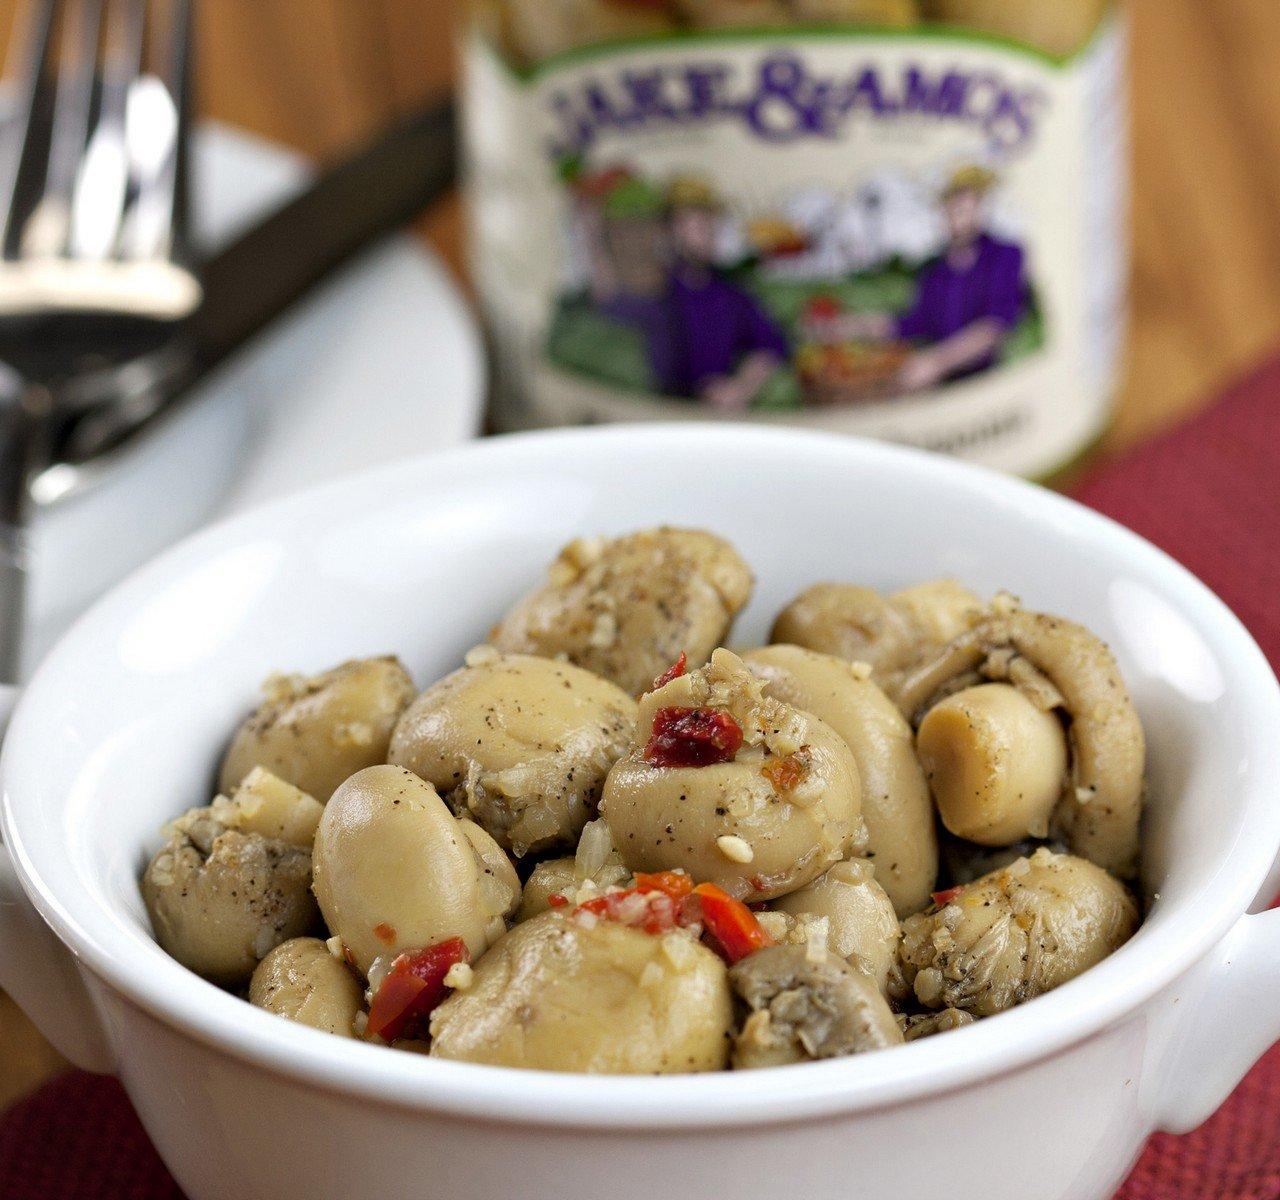 Jake & Amos Marinated Mushrooms, 32 Oz. Jar (Pack of 2) by Jake & Amos (Image #3)